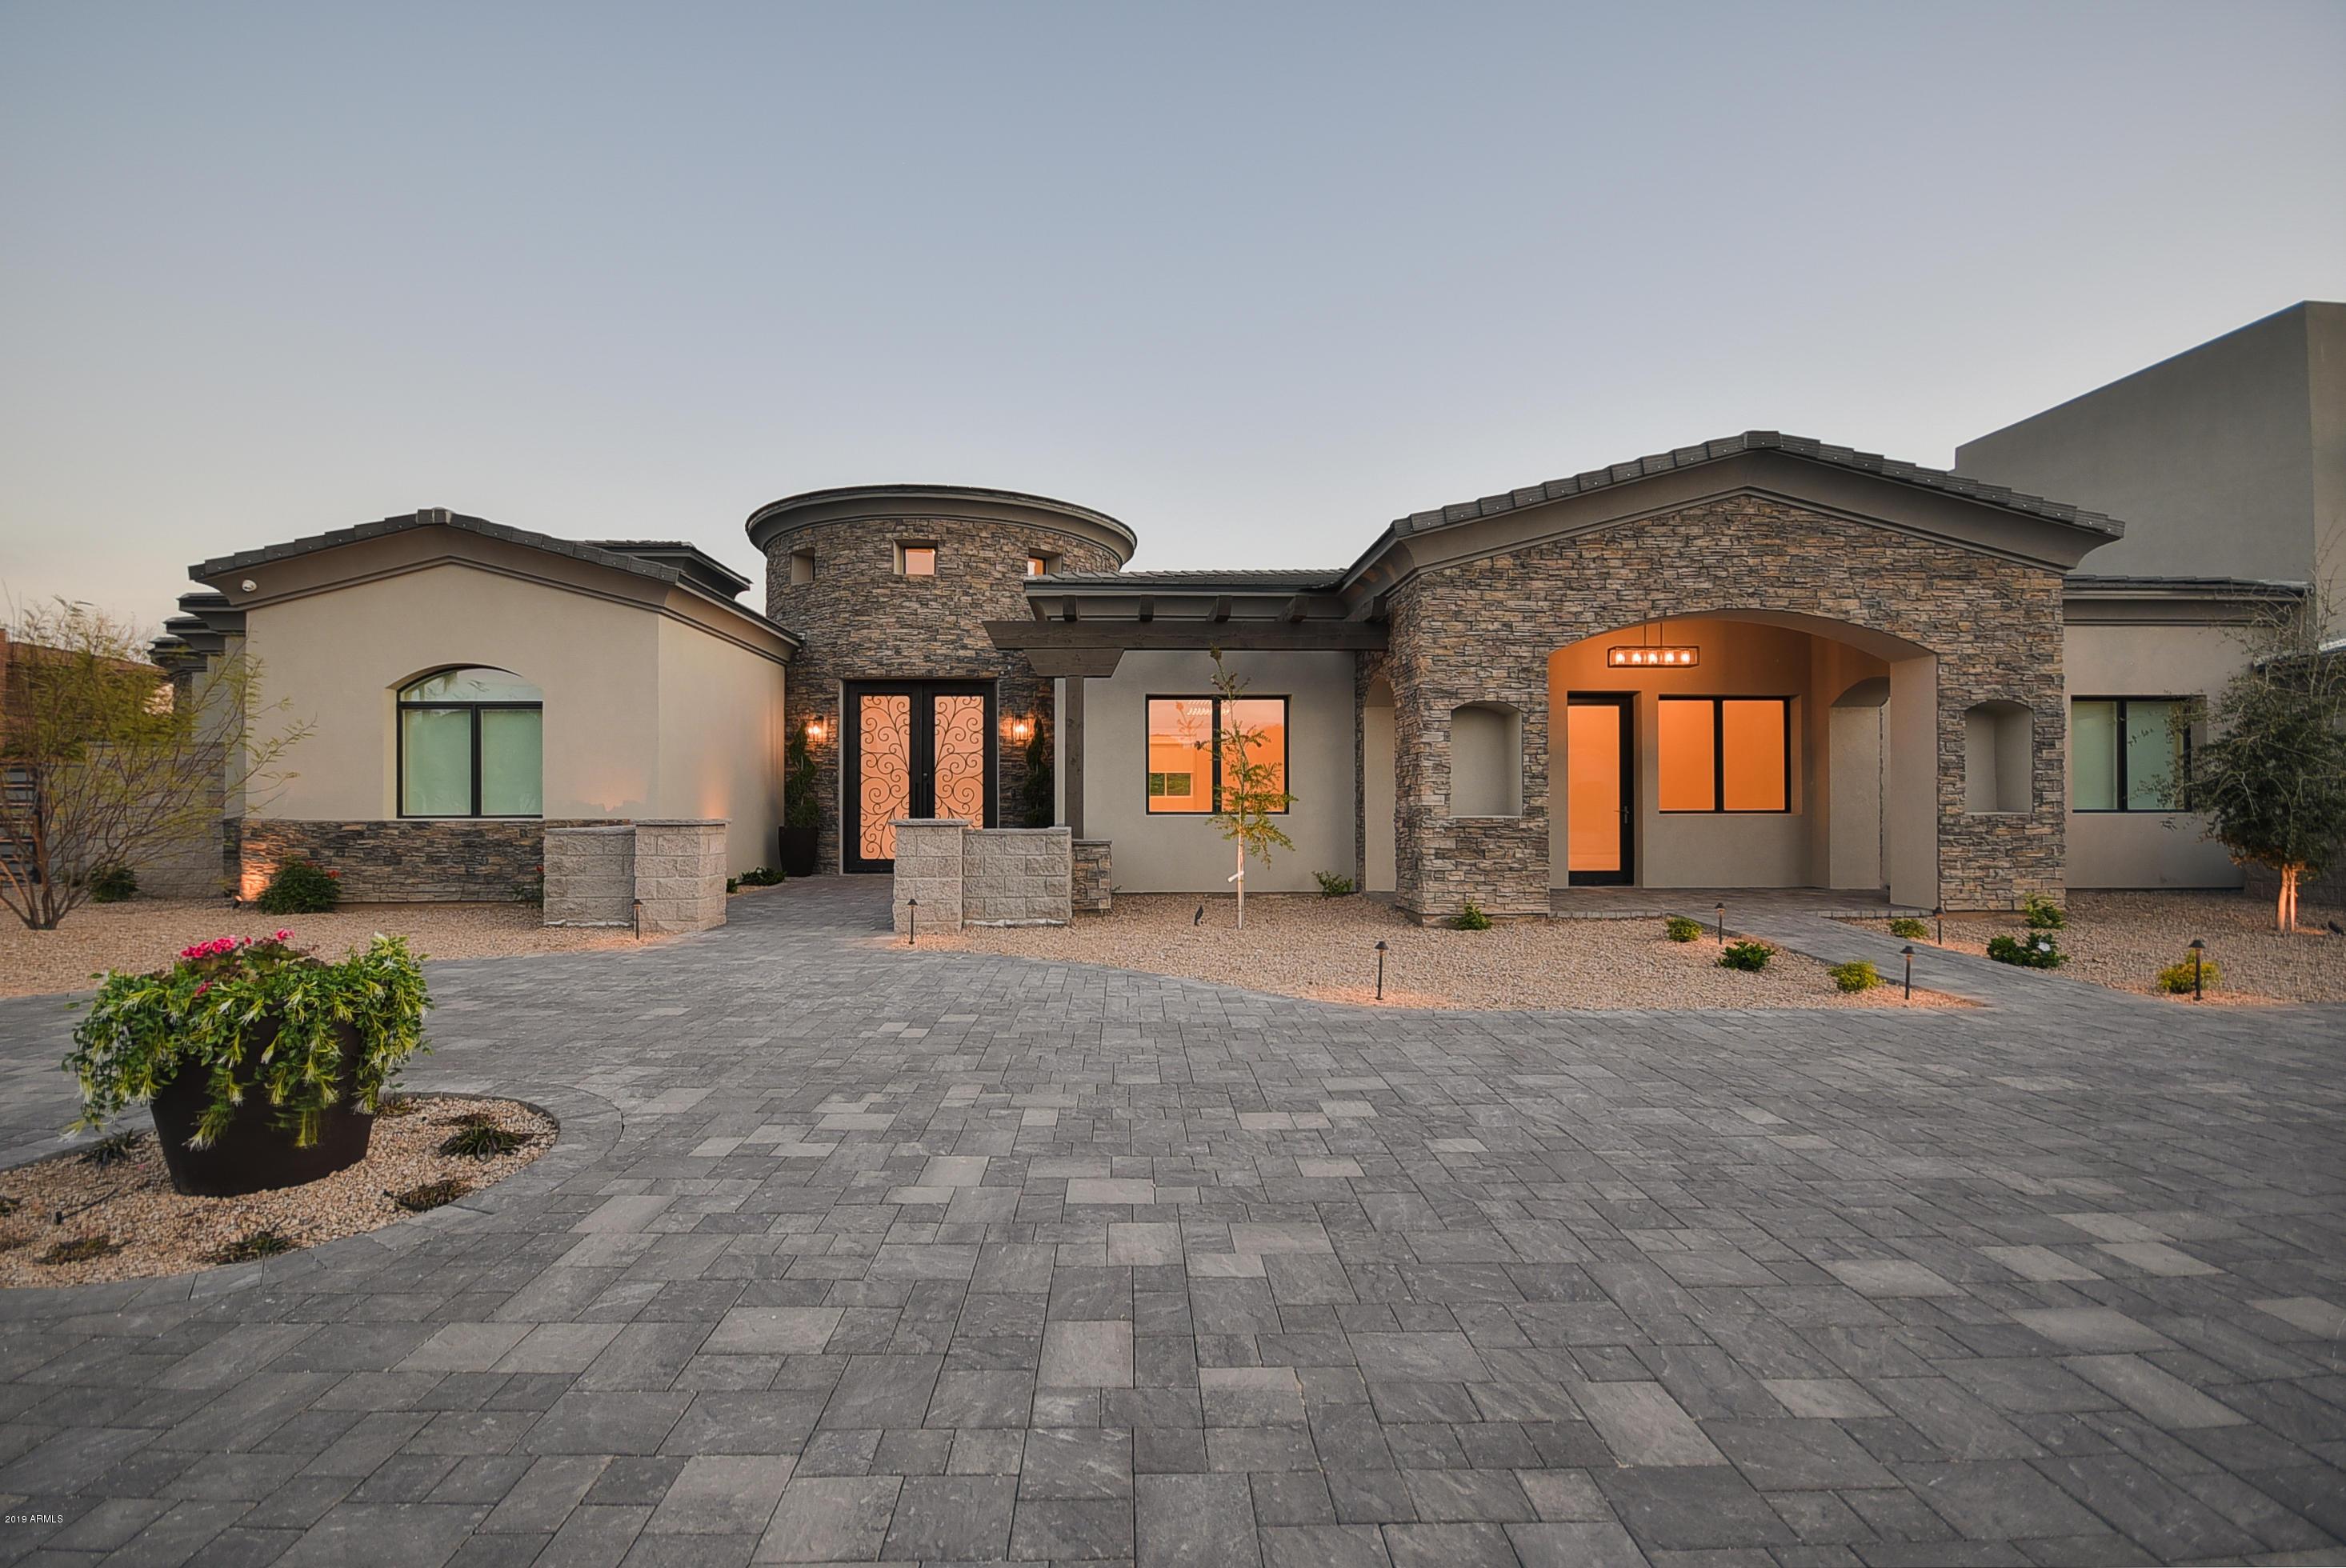 Photo of 3715 E DUNLAP Avenue, Phoenix, AZ 85028